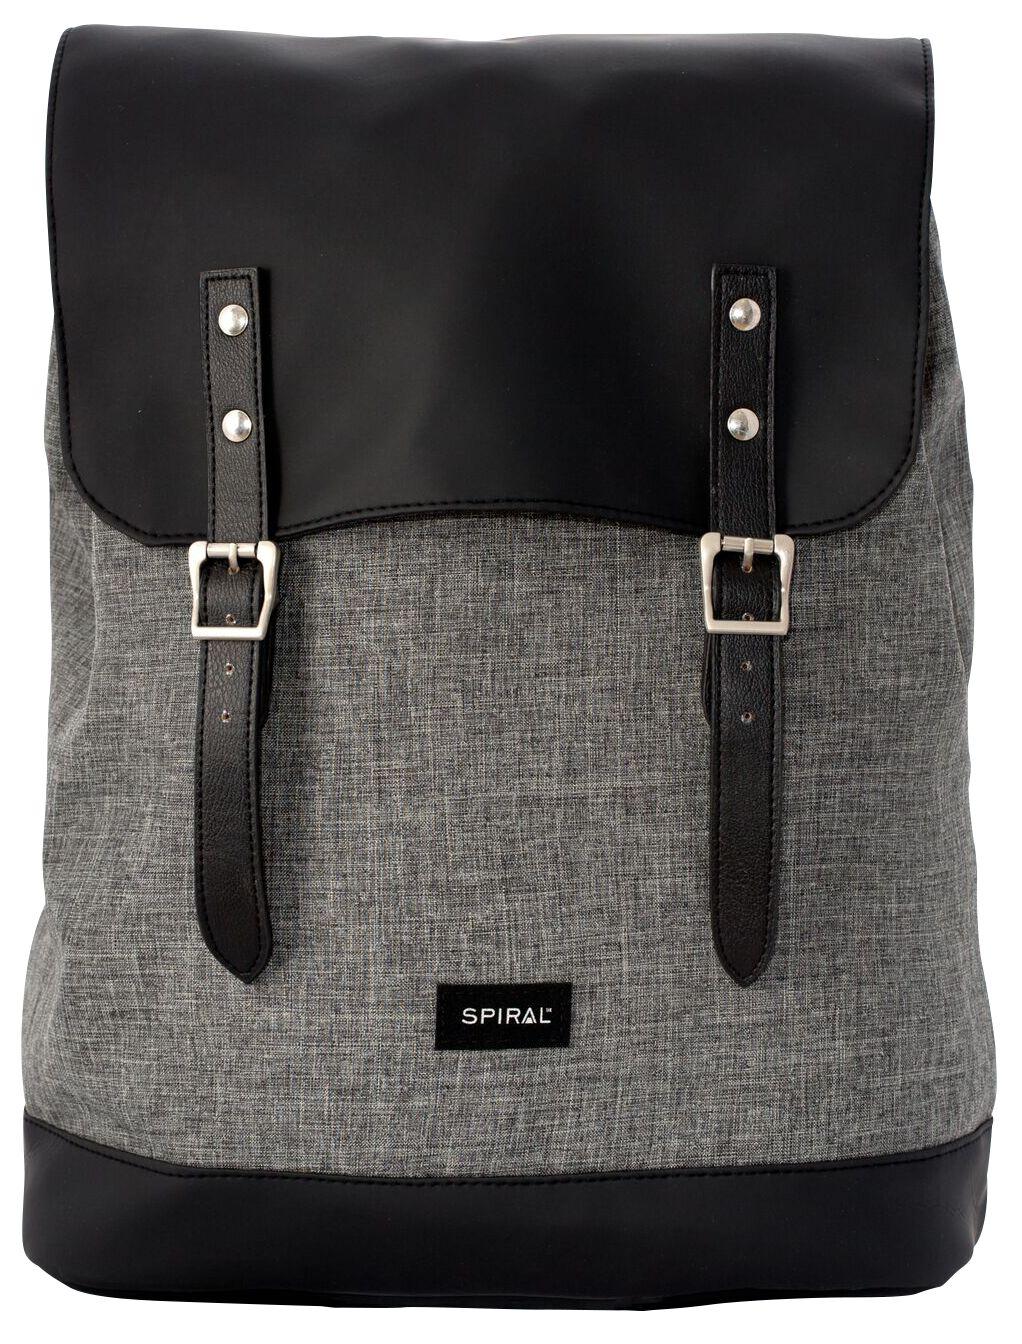 Marki - Torby i Plecaki - Plecak Spiral UK Crosshatch Charcoal Plecak czarny/grafit - 370953